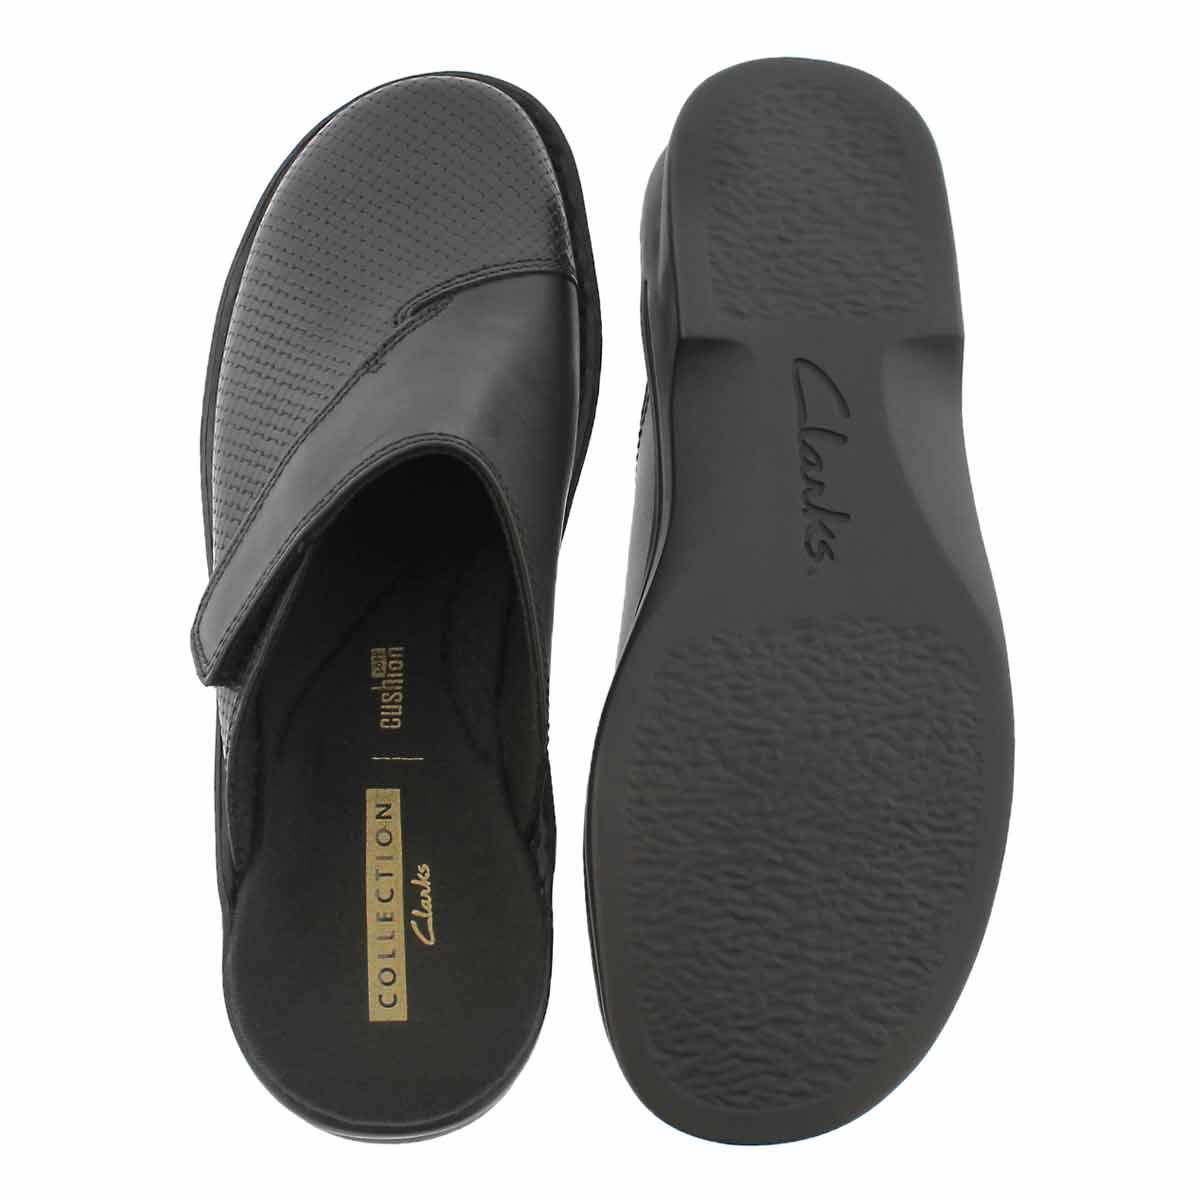 Lds Patty Tayna black casual clog